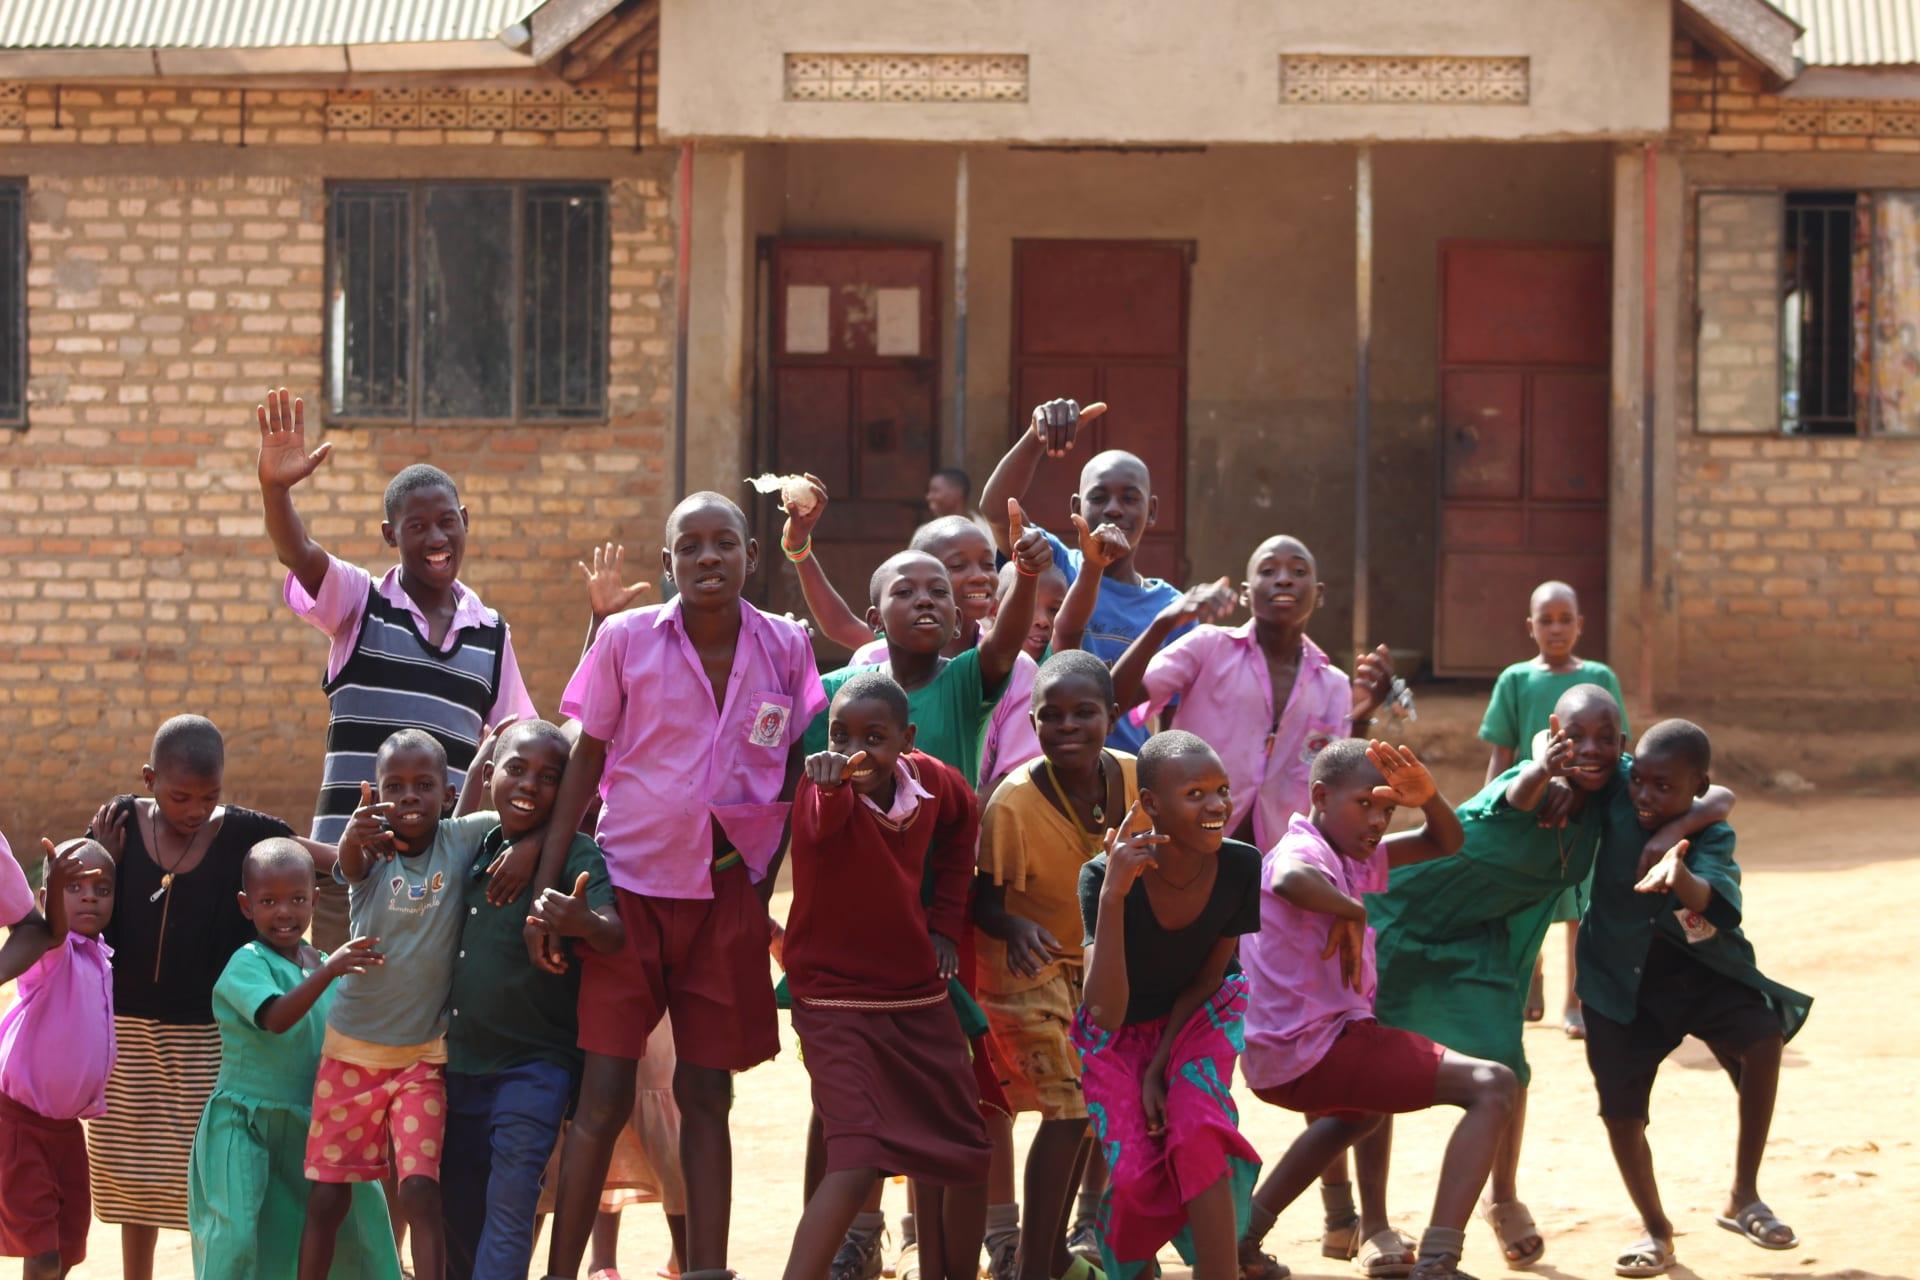 Masaka - Good Samaritan School for the Deaf & The Kitengeesa Community